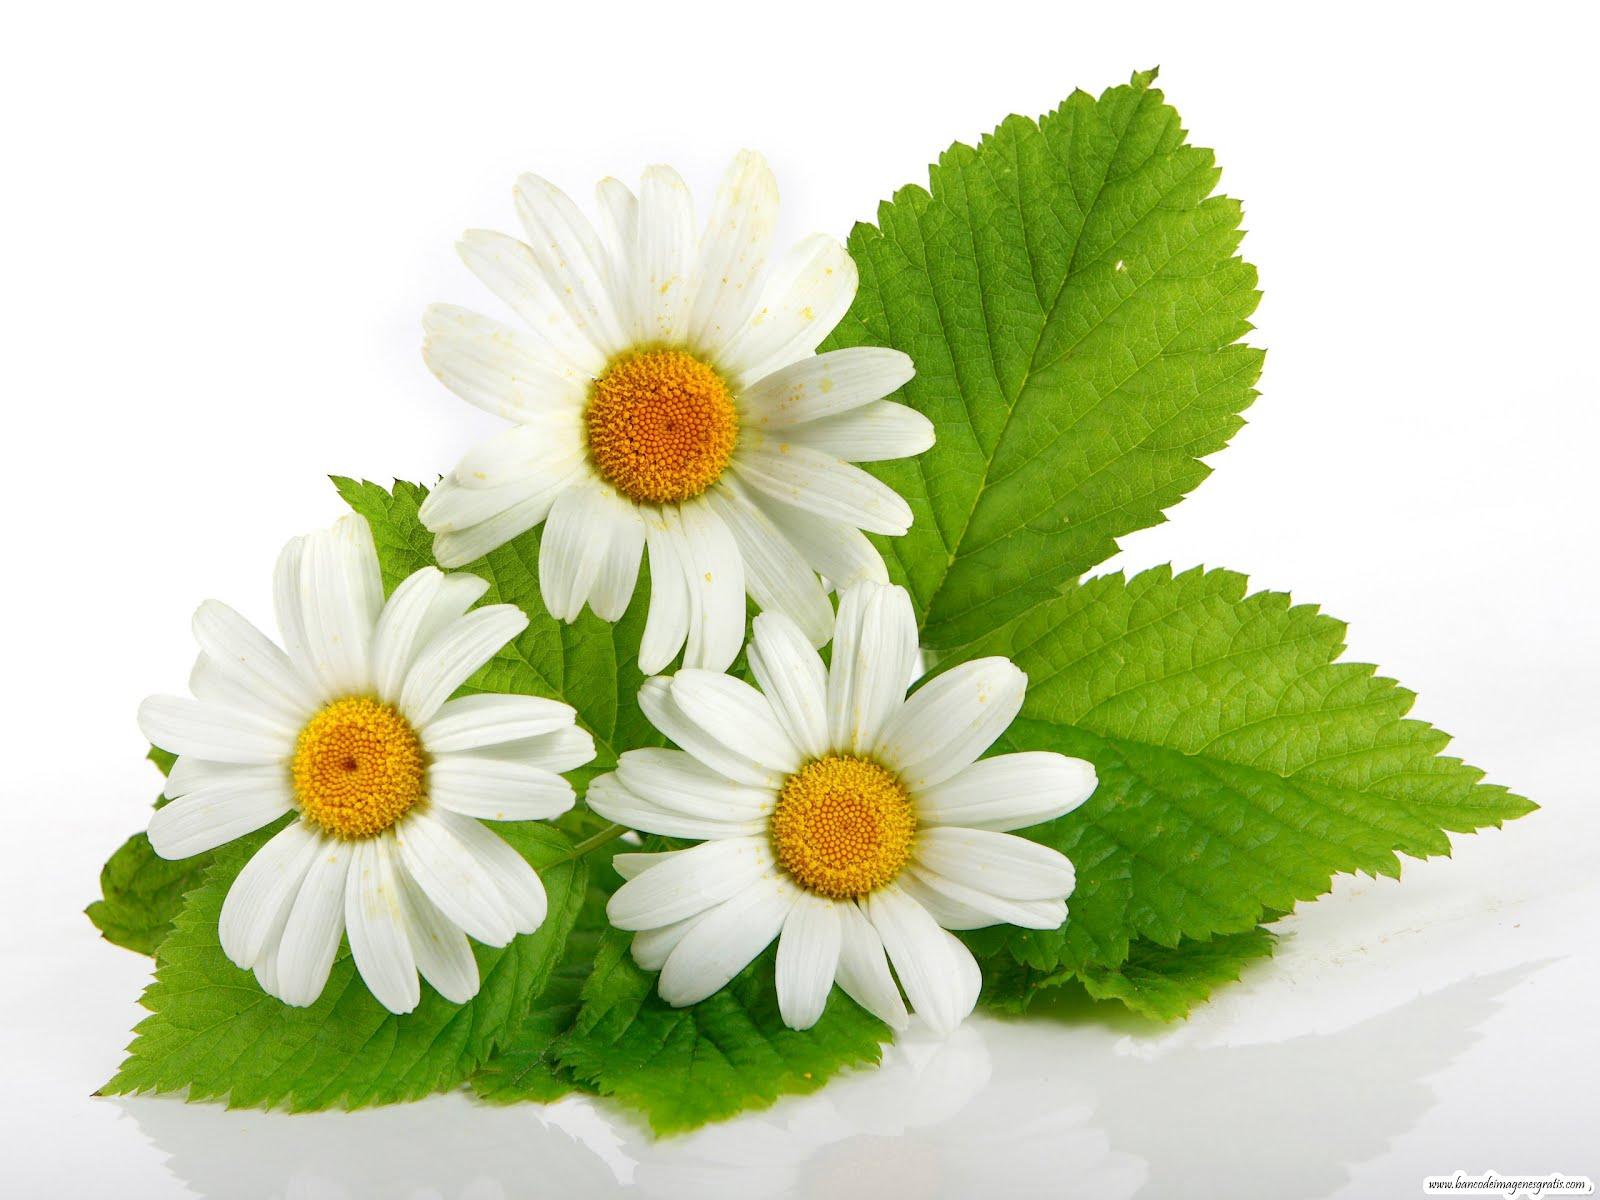 Imagenes De Flores Animadas Bonitas 49 Images Las Mejores Imagenes